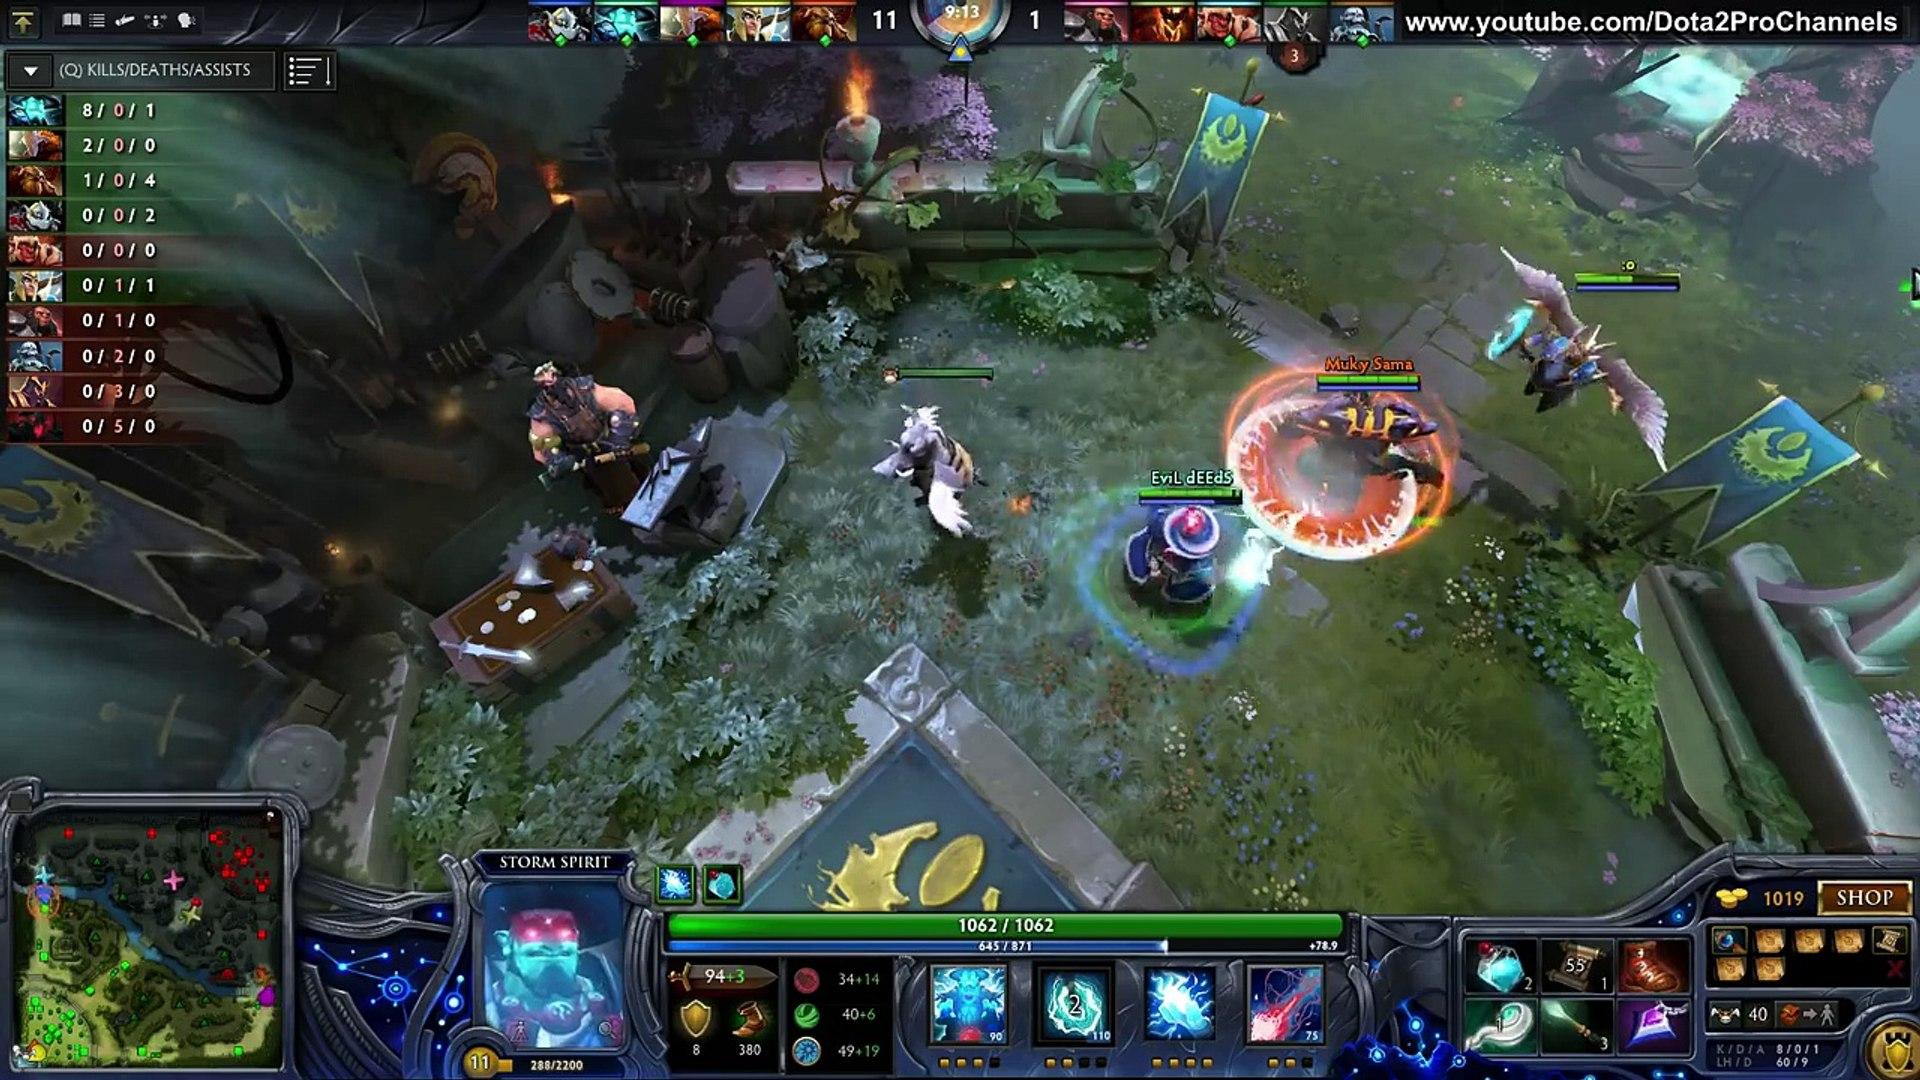 SumaiL (EG) - Storm Spirit Pro Gameplay | 20-0 | Mid MMR [Dota 2 Pro] #2